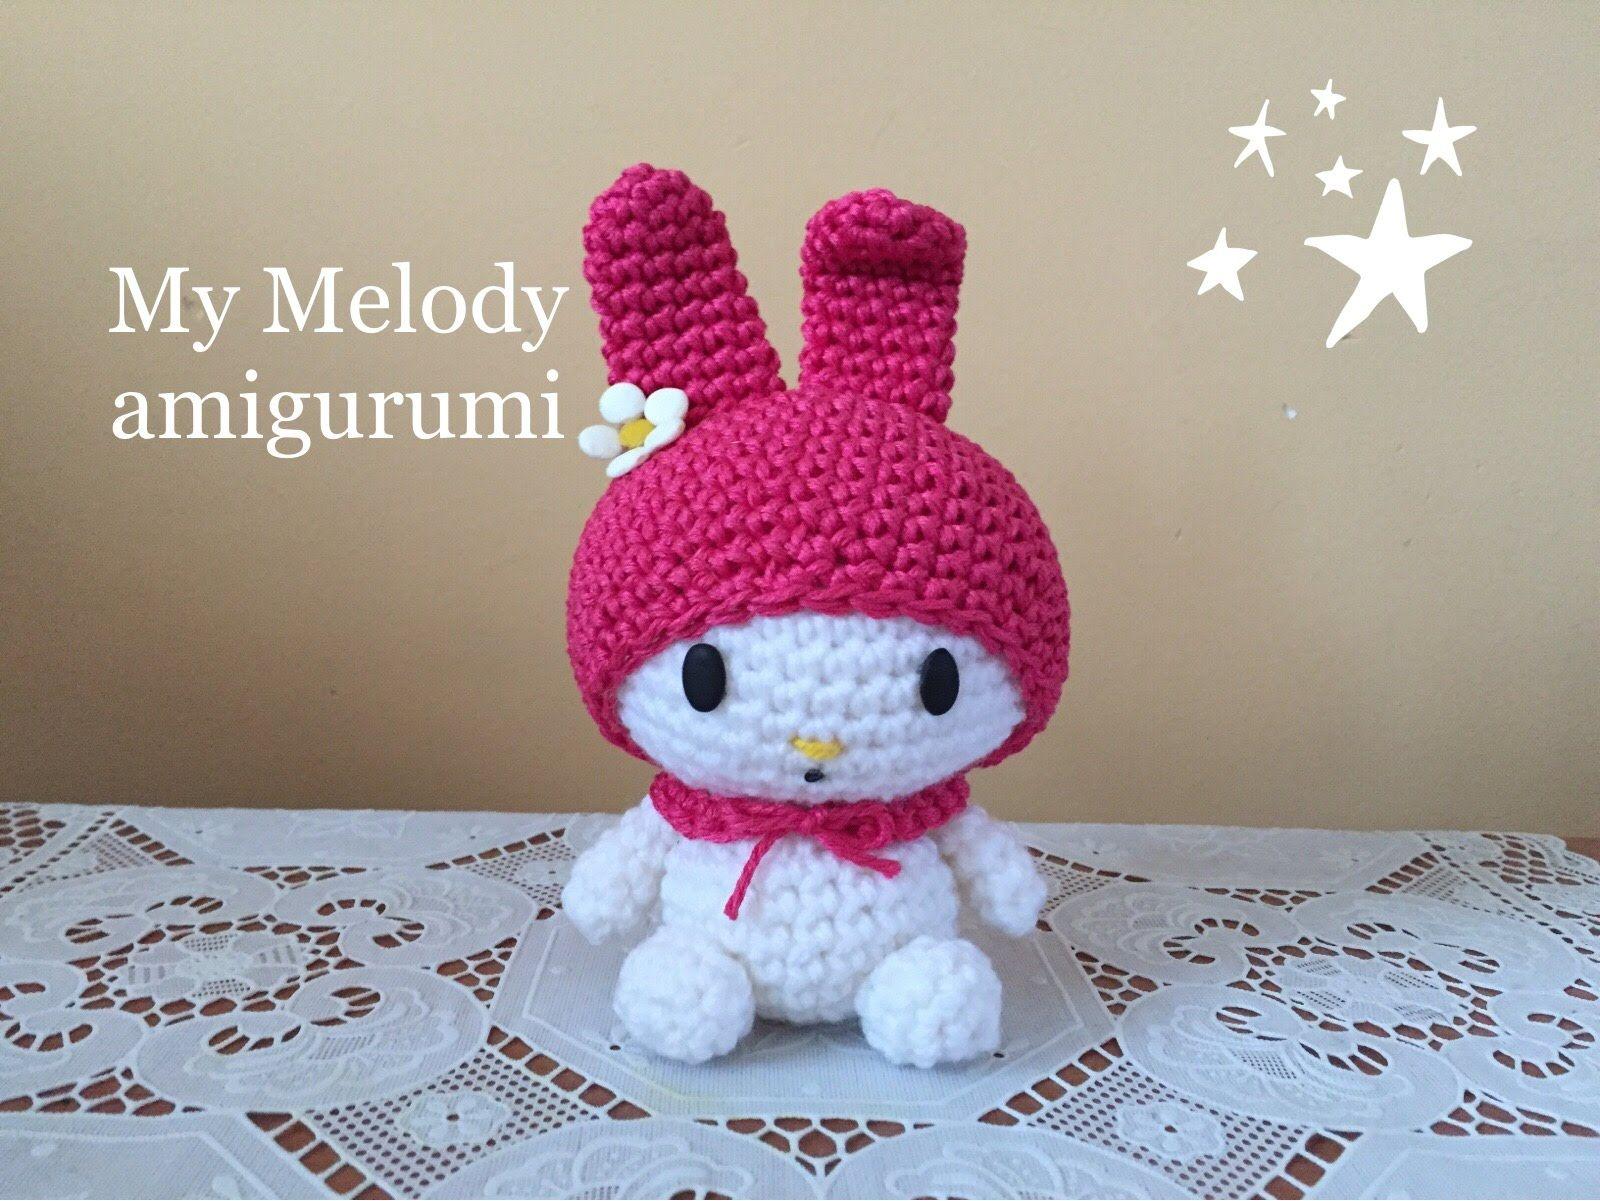 Tejido Amigurumi Tutorial : My melody amigurumi tutorial how to crochet my melody youtube